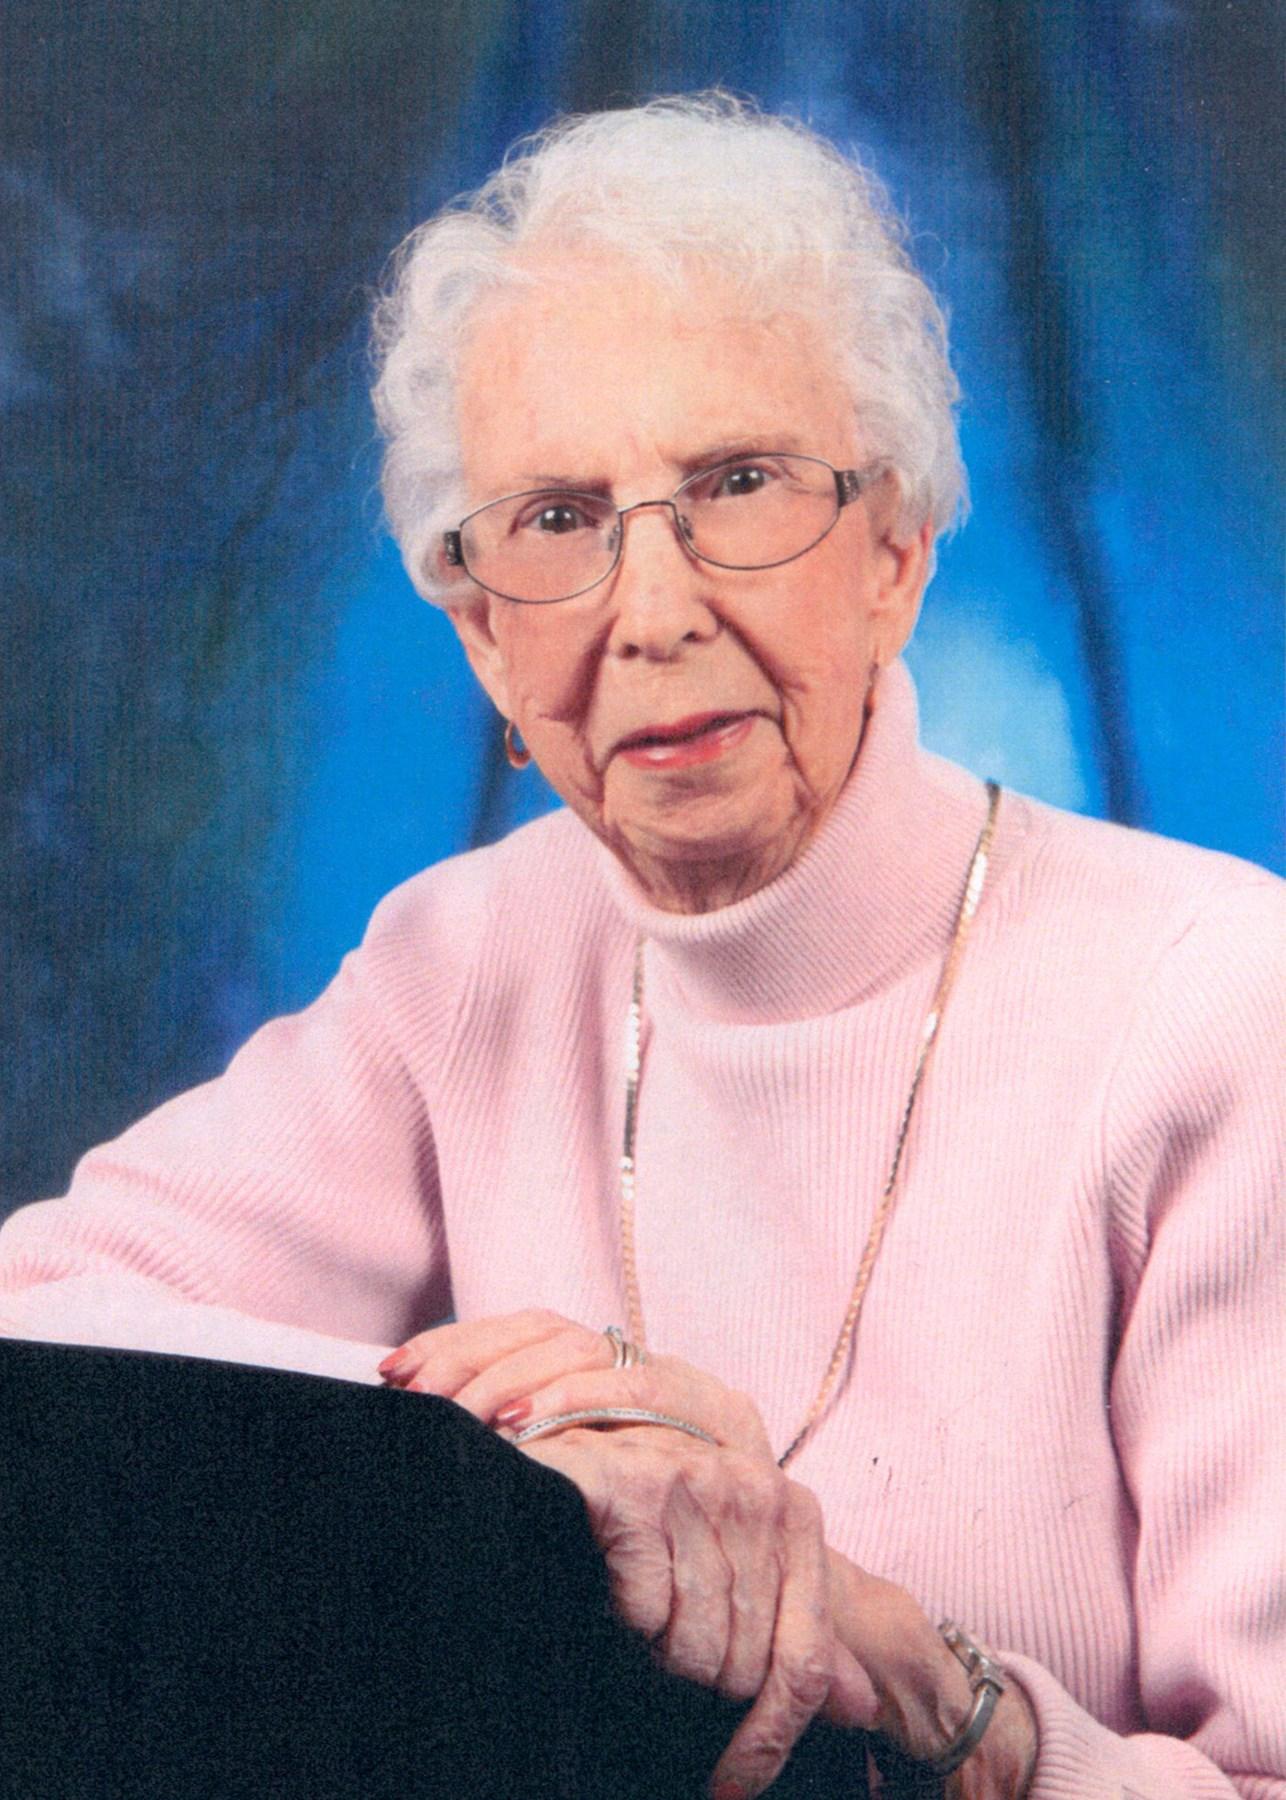 Obituary | Myrna Marie Lawson of Dartmouth, Nova Scotia